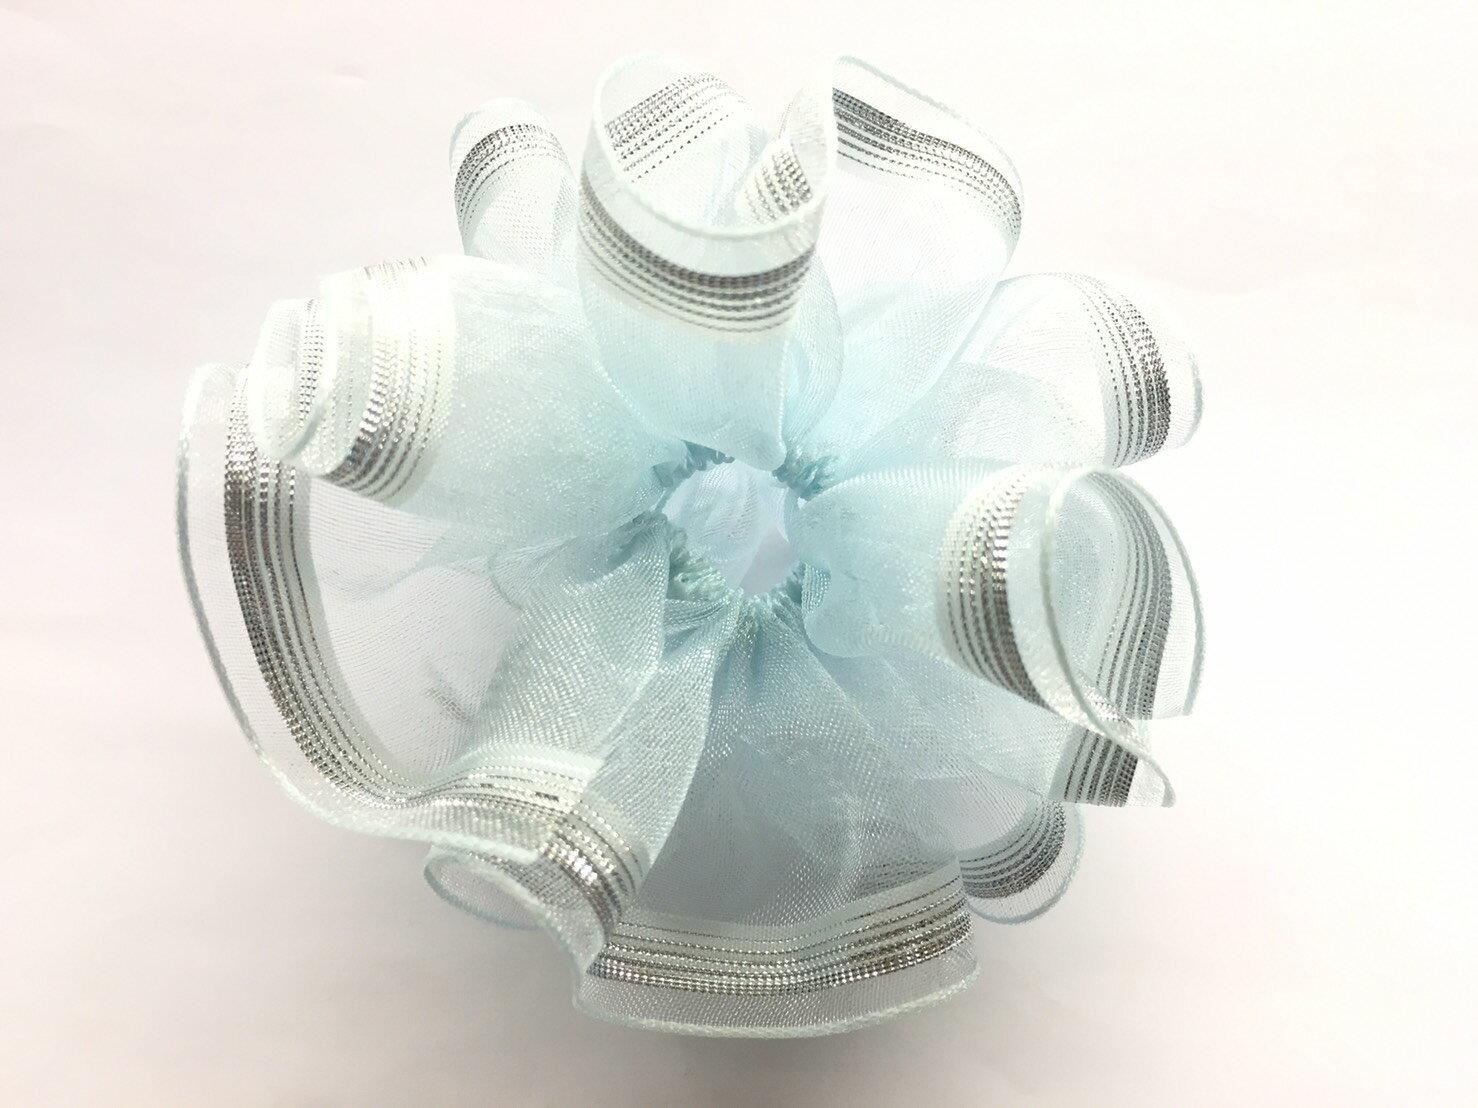 【Crystal Rose緞帶專賣店】單邊漸層拉花帶 38mm 3碼 (4色) 0